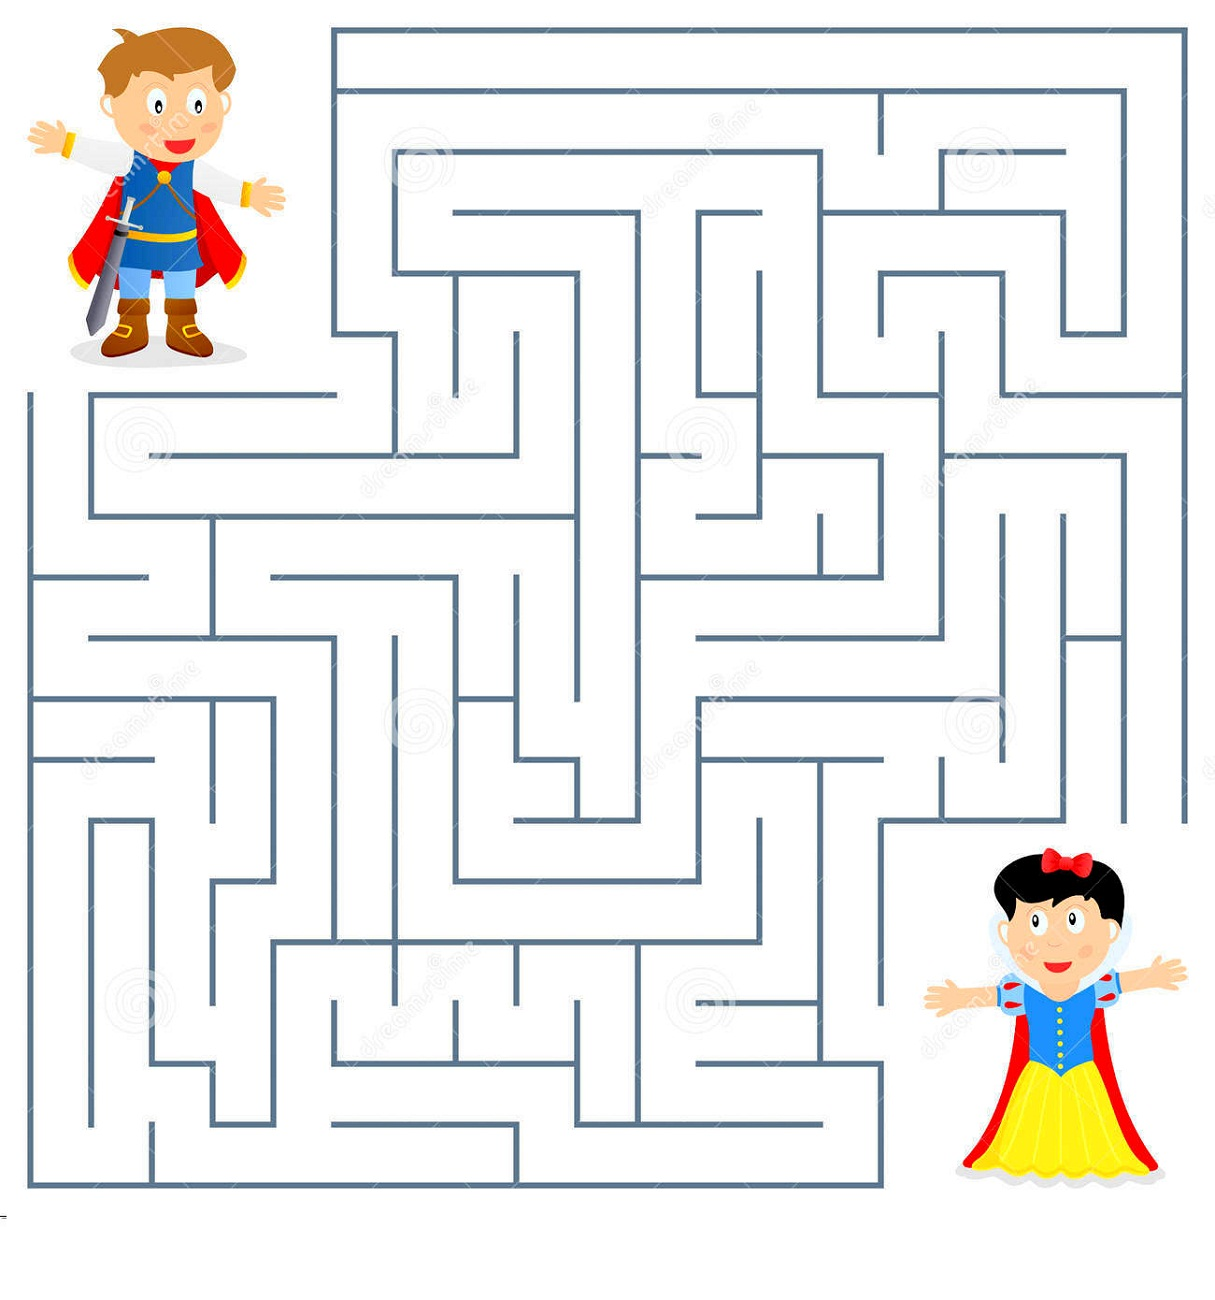 fun-mazes-for-kids-princess